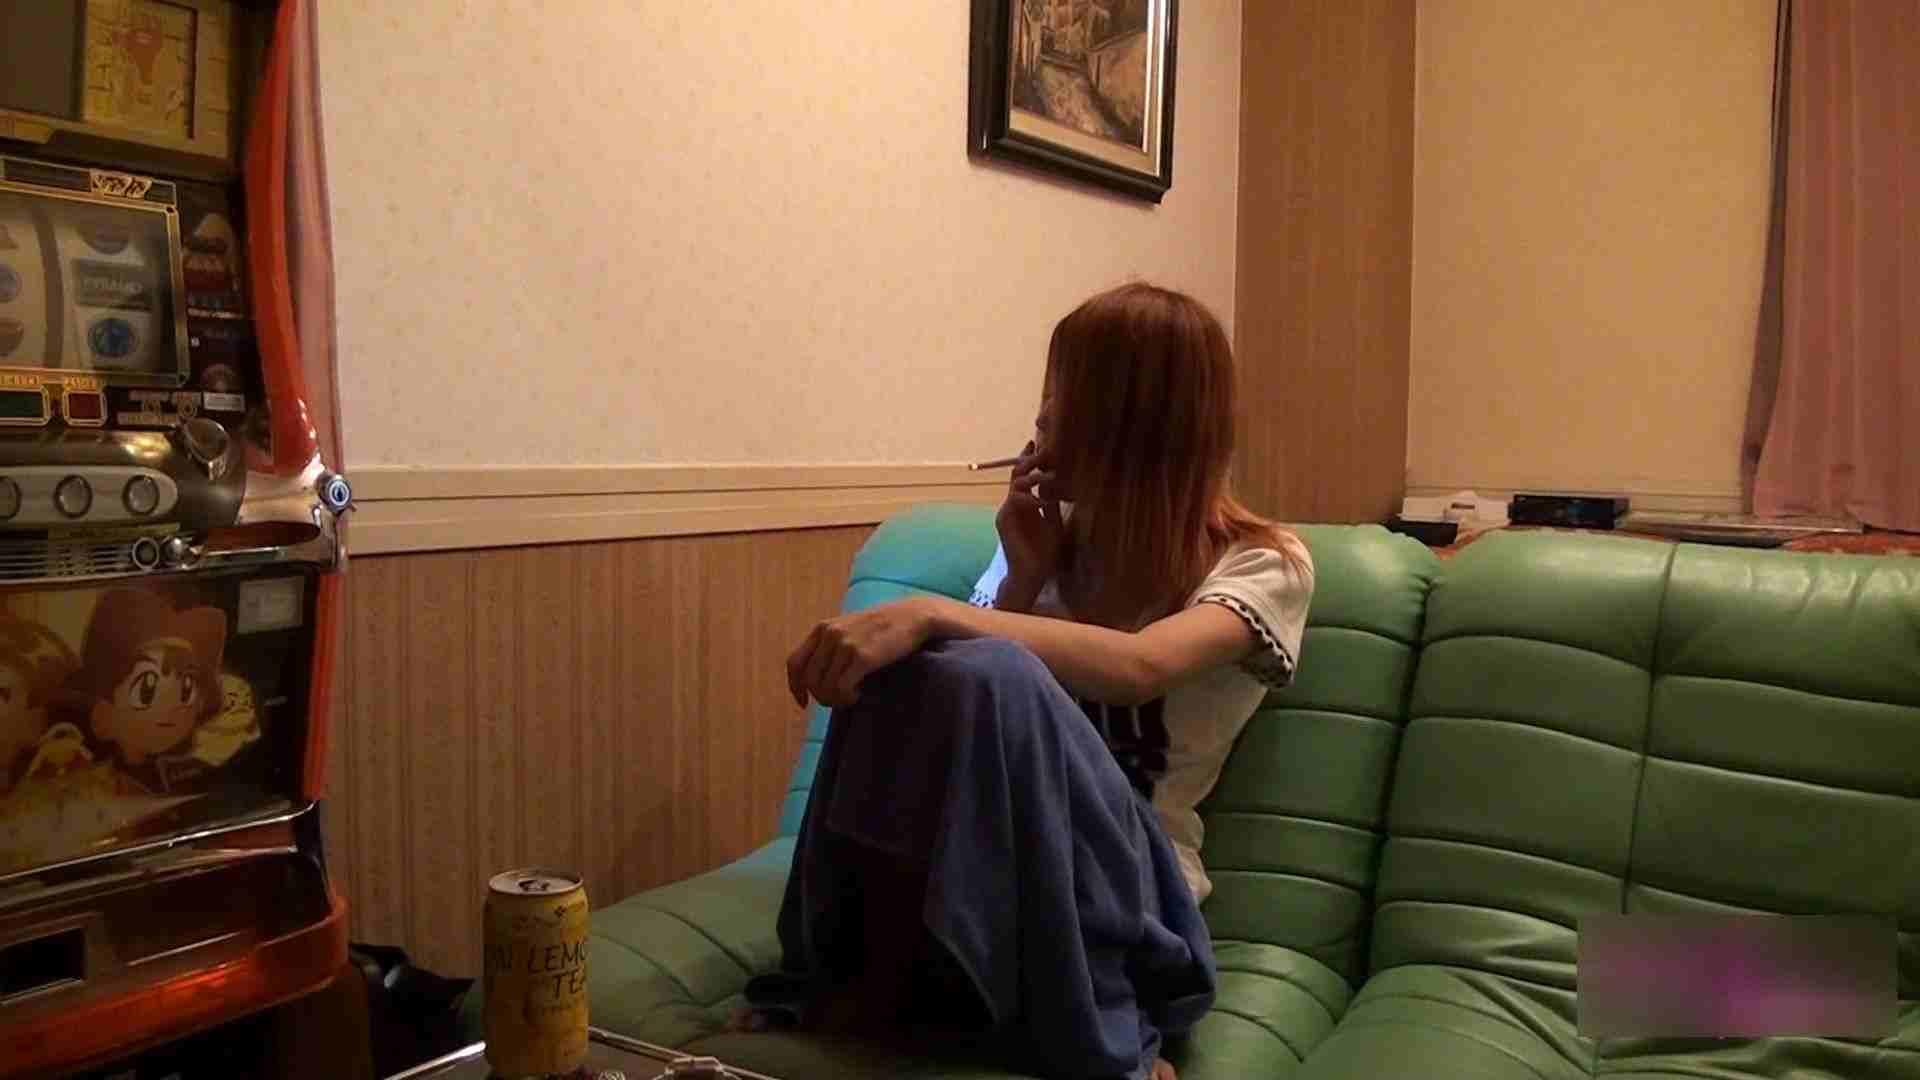 S級厳選美女ビッチガールVol.01 美女丸裸  87pic 24